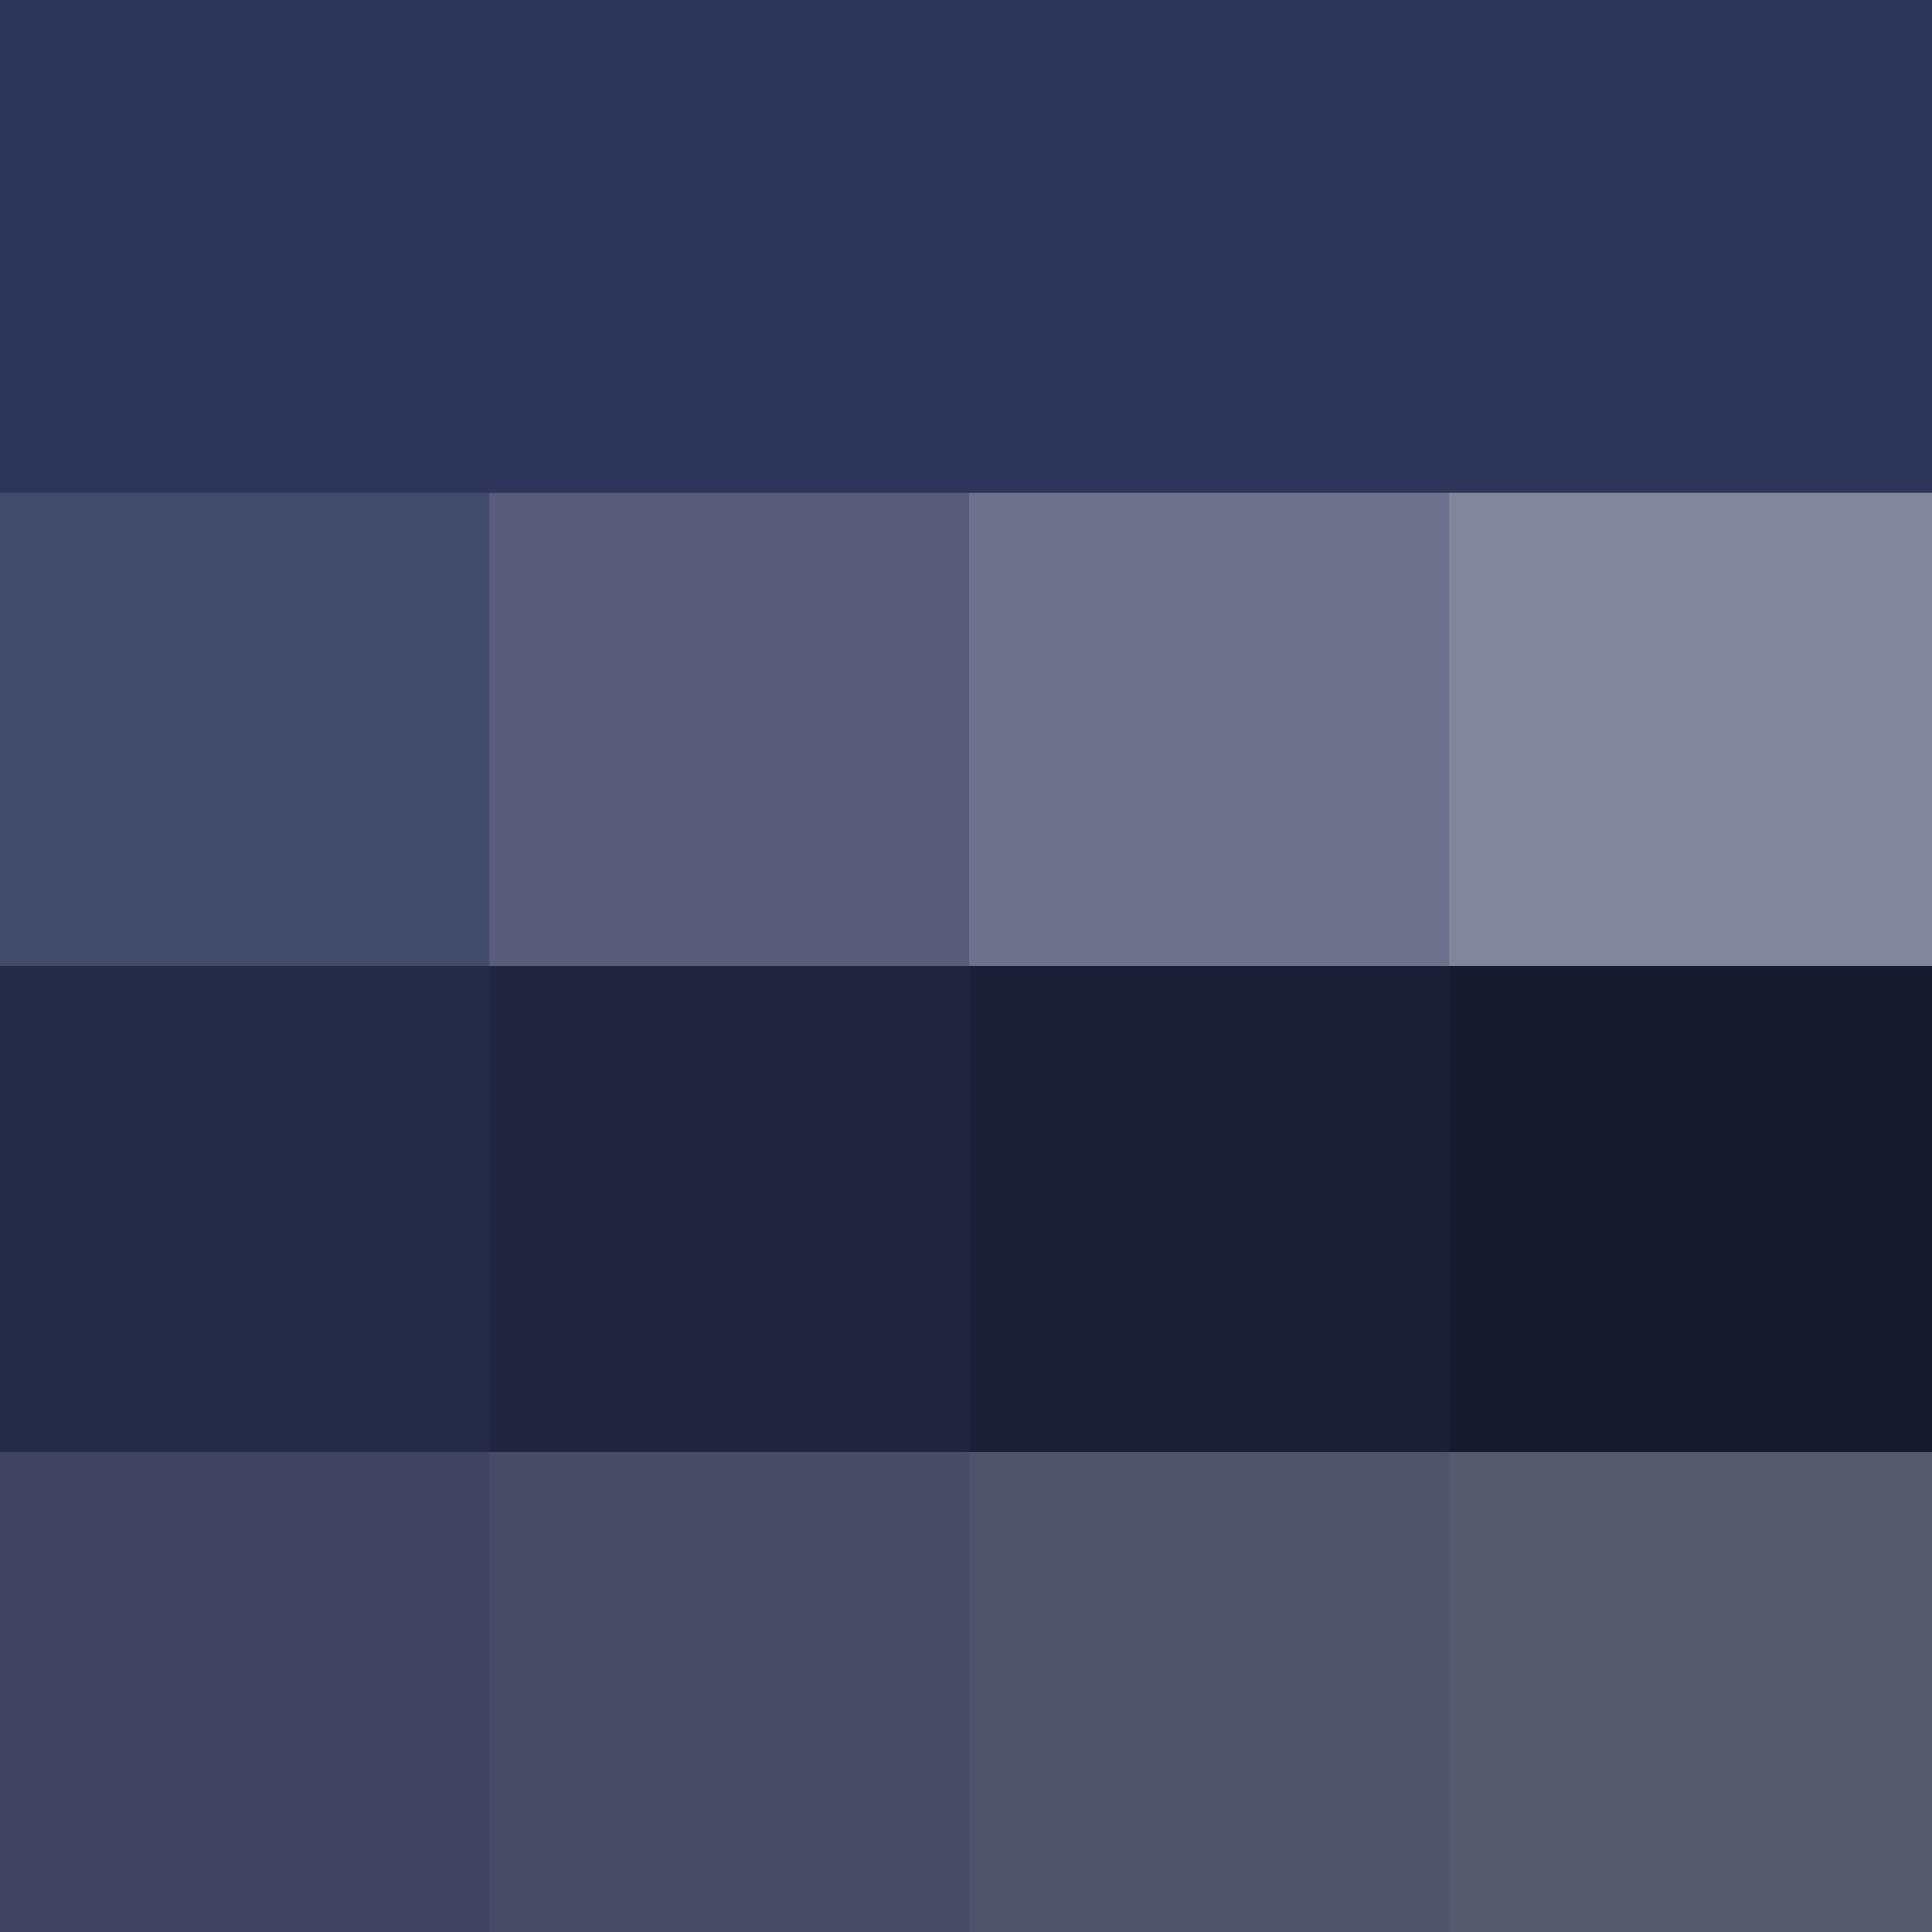 Grayish Blue ♔Thd♔ Pantone Blue Depths  Hue  Pure Color  With Tints Hue